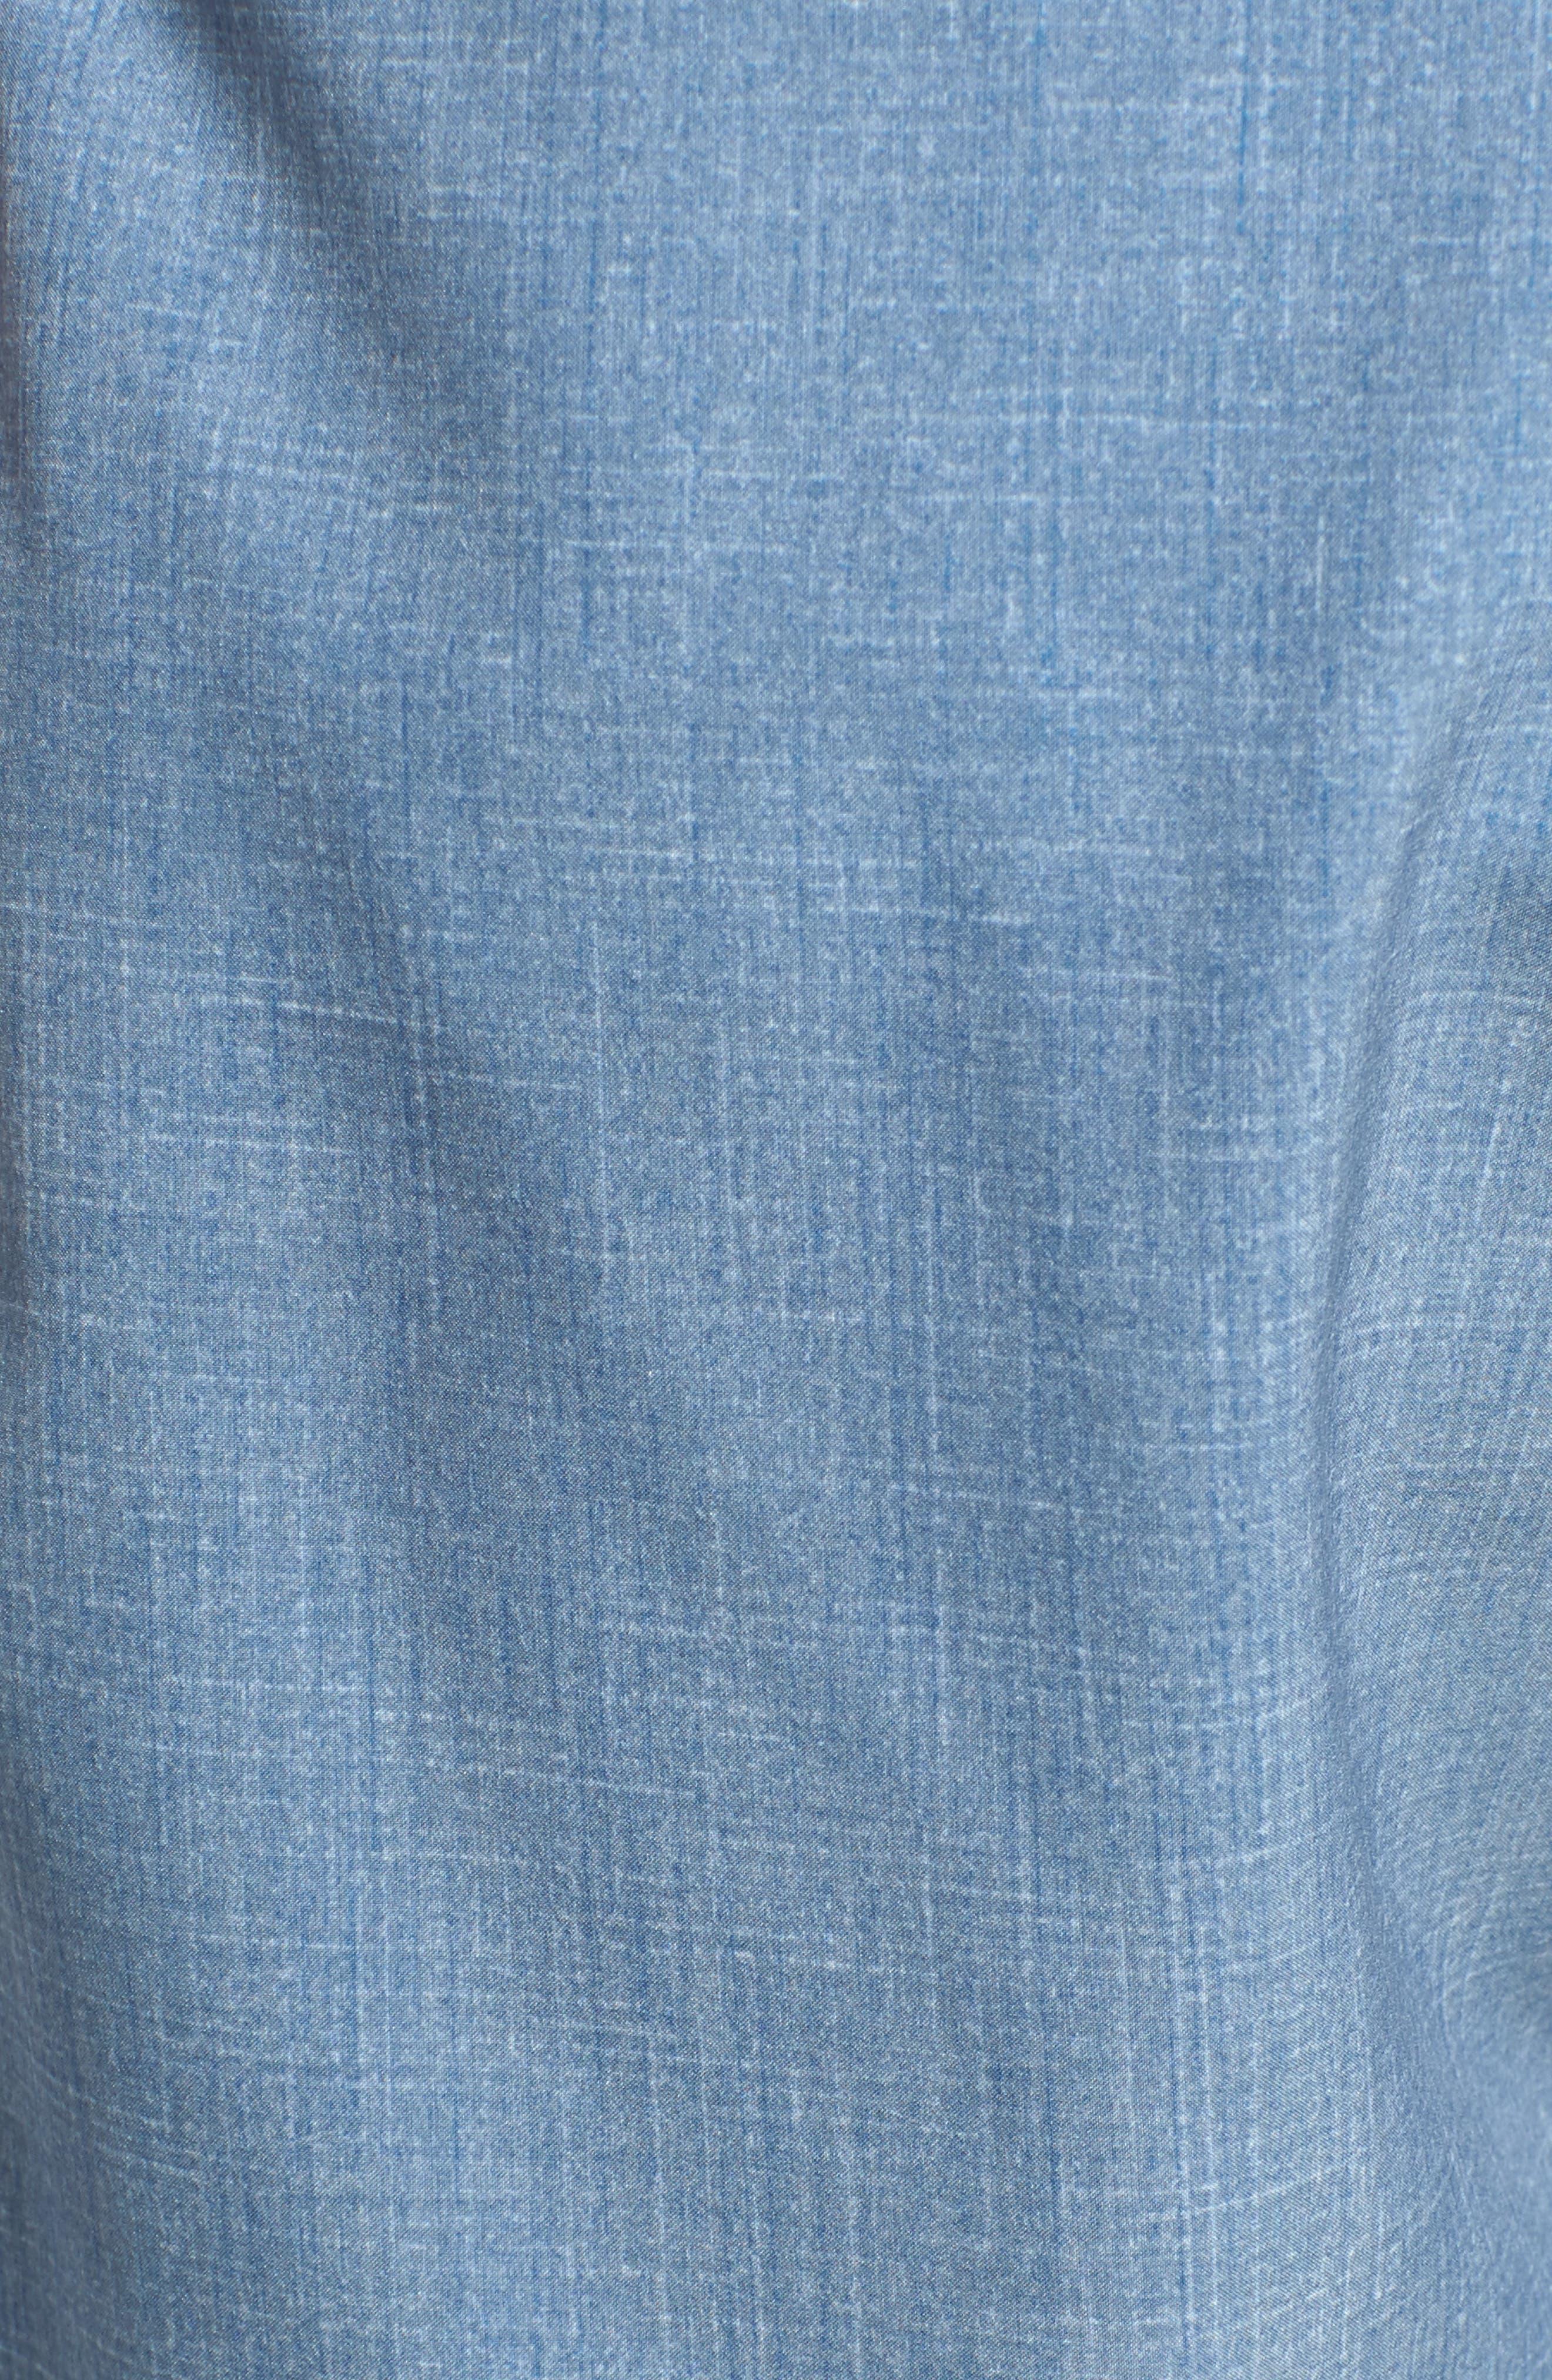 Digits Shorts,                             Alternate thumbnail 5, color,                             020